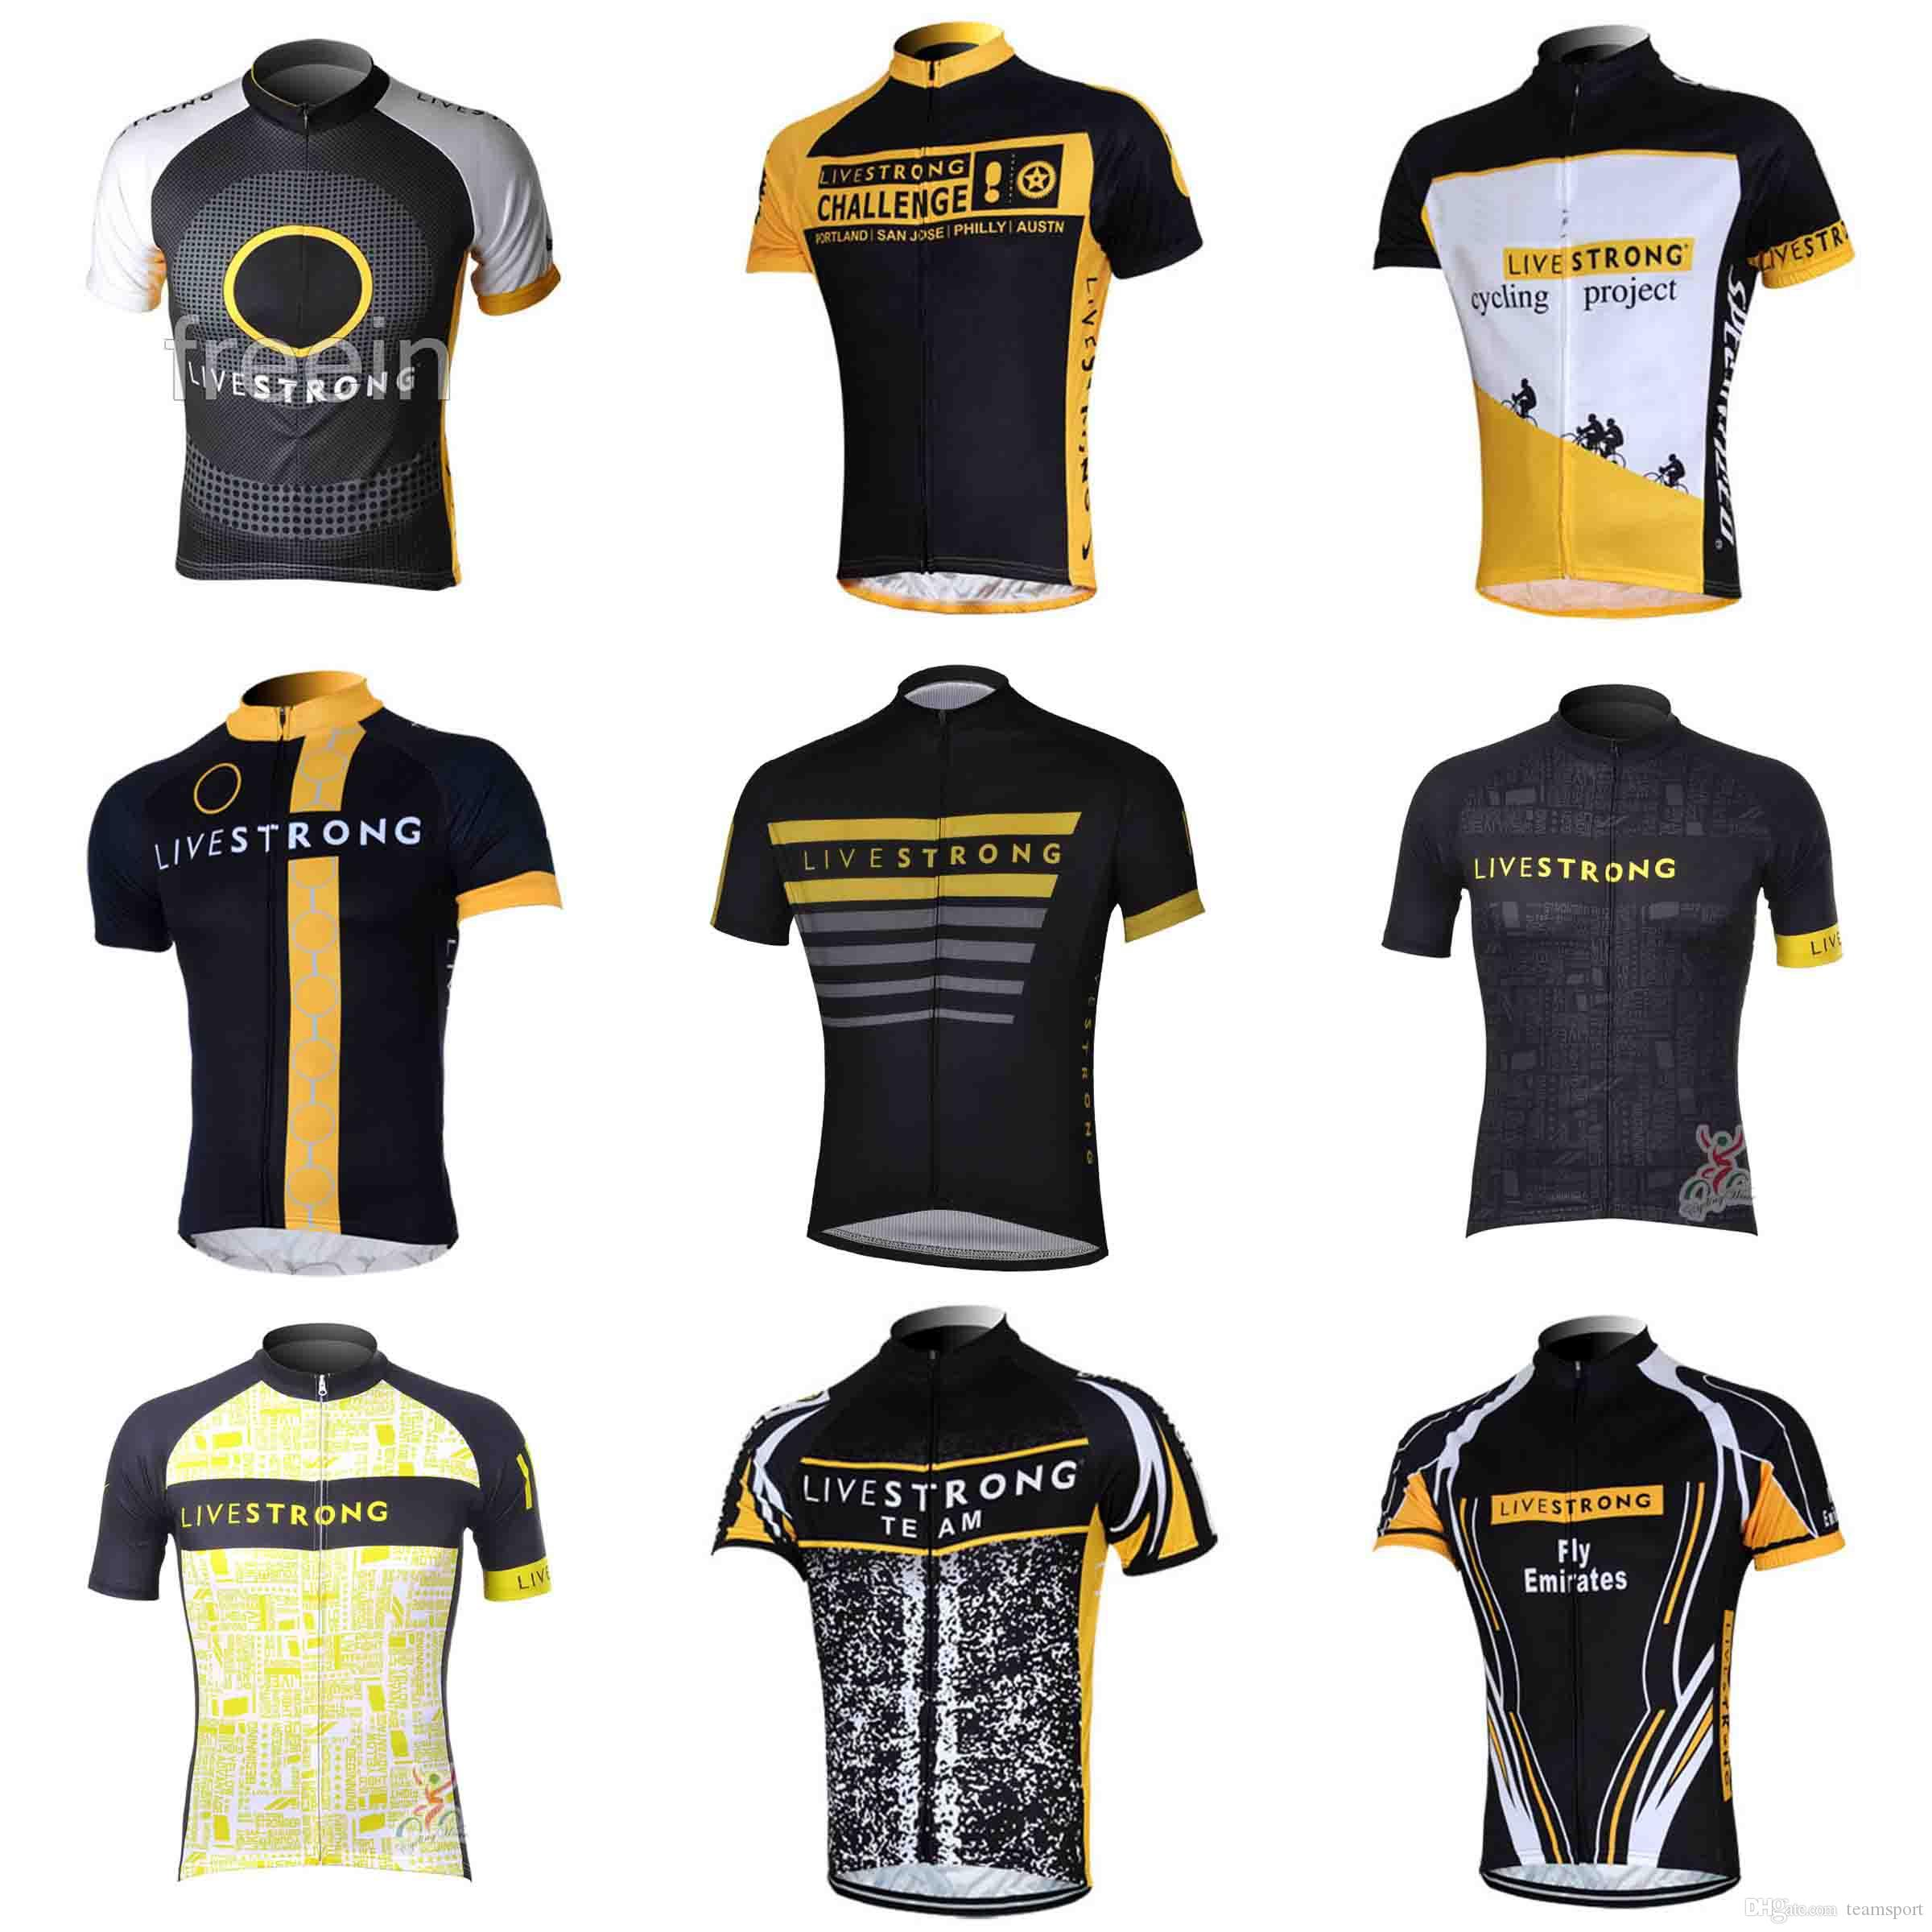 872217cc9 LIVESTRONG Team Cycling Jersey 2018 New Hot Men Cycling Jersey Cycling  Clothes Wholesale Cycling Clothing Quick Dry Sportwear 840209 Cheap Cycling  Jerseys ...